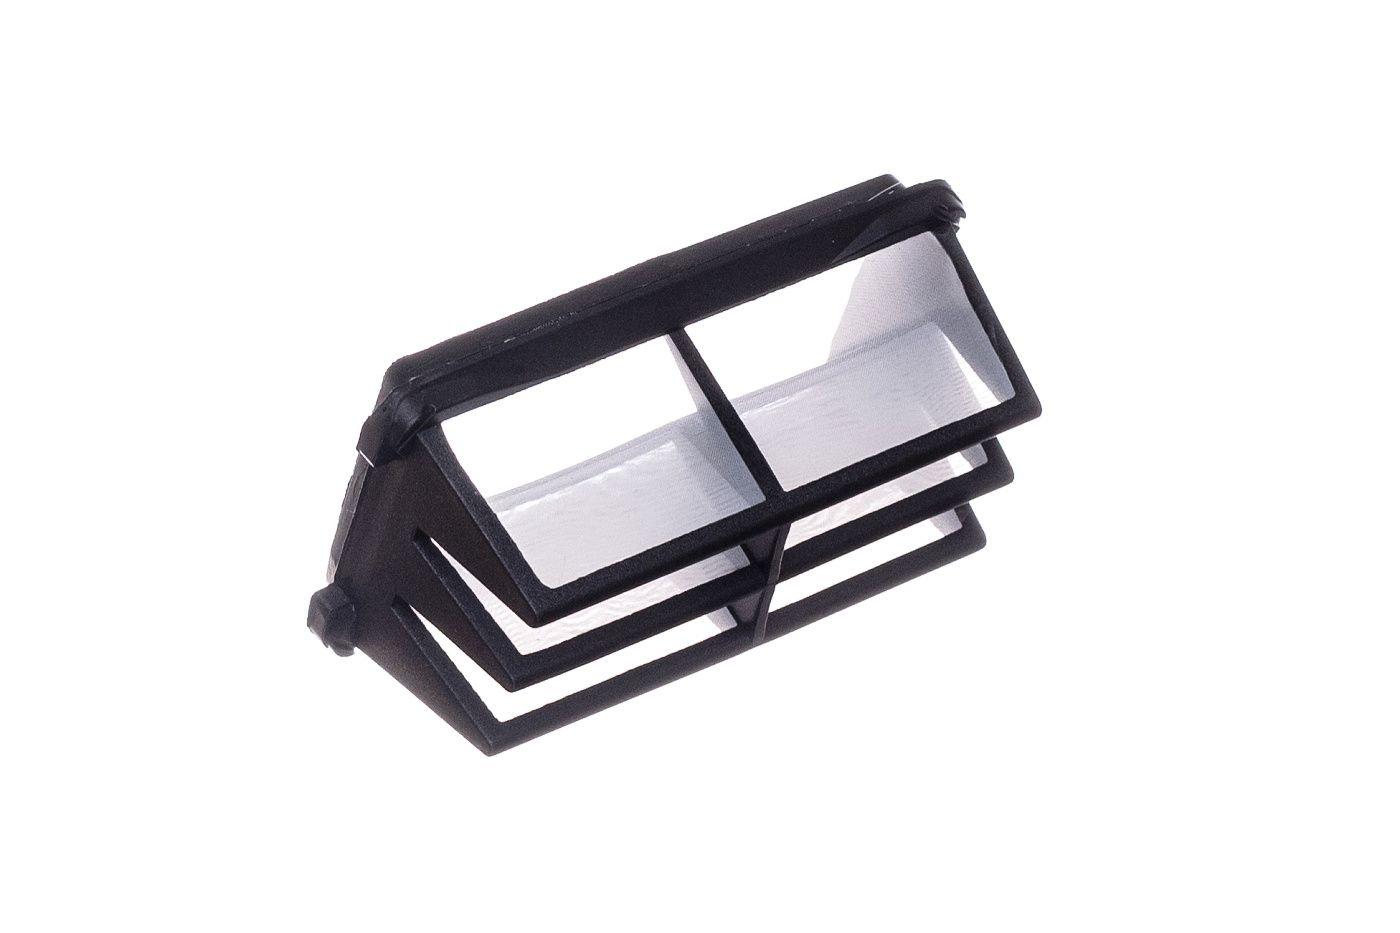 Vzduchový filtr Husqvarna 40 45